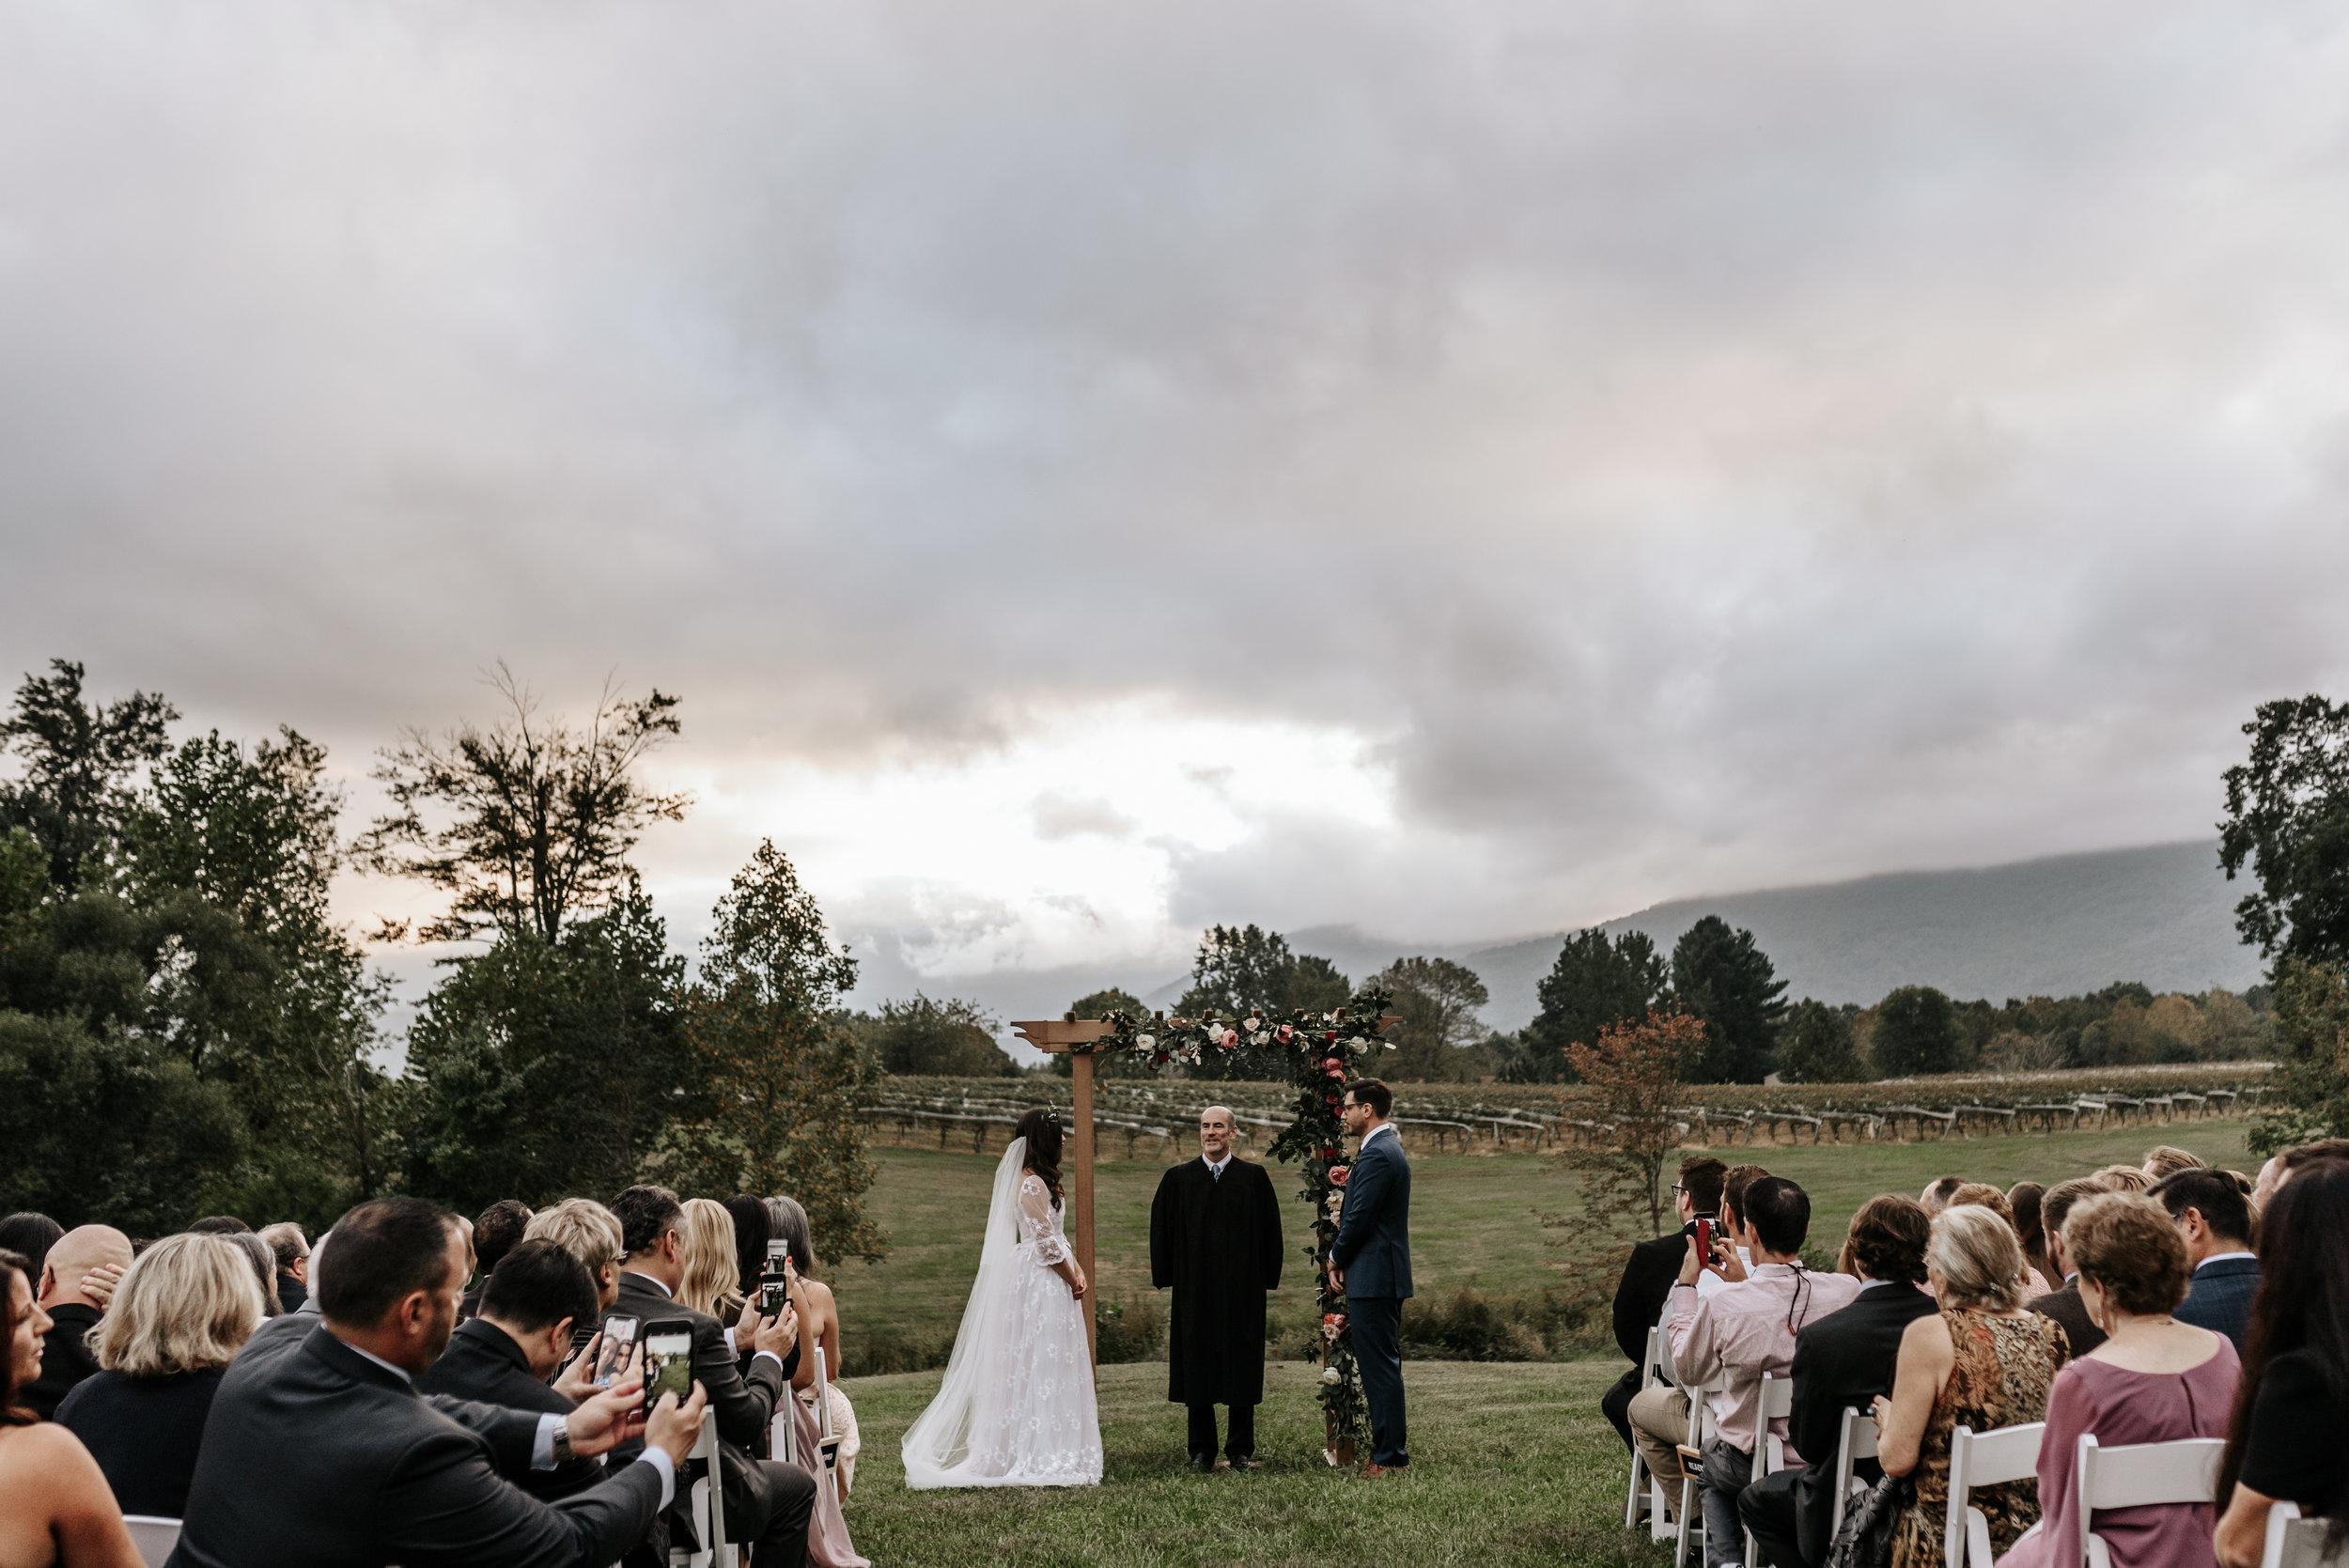 Veritas-Vineyards-and-Winery-Wedding-Photography-Afton-Virginia-Yasmin-Seth-Photography-by-V-9630.jpg